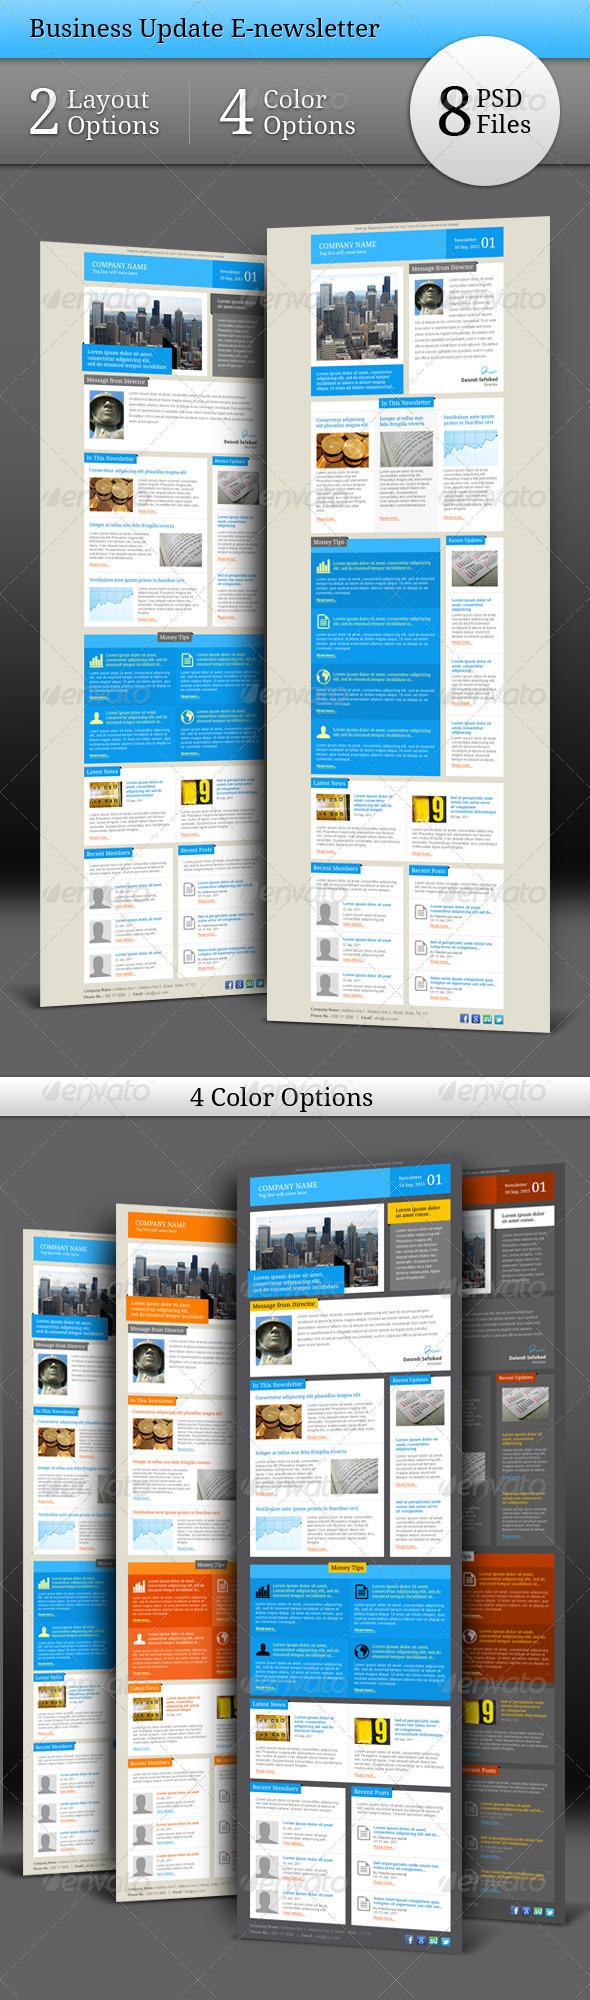 GraphicRiver Business Update E-newsletter 534574